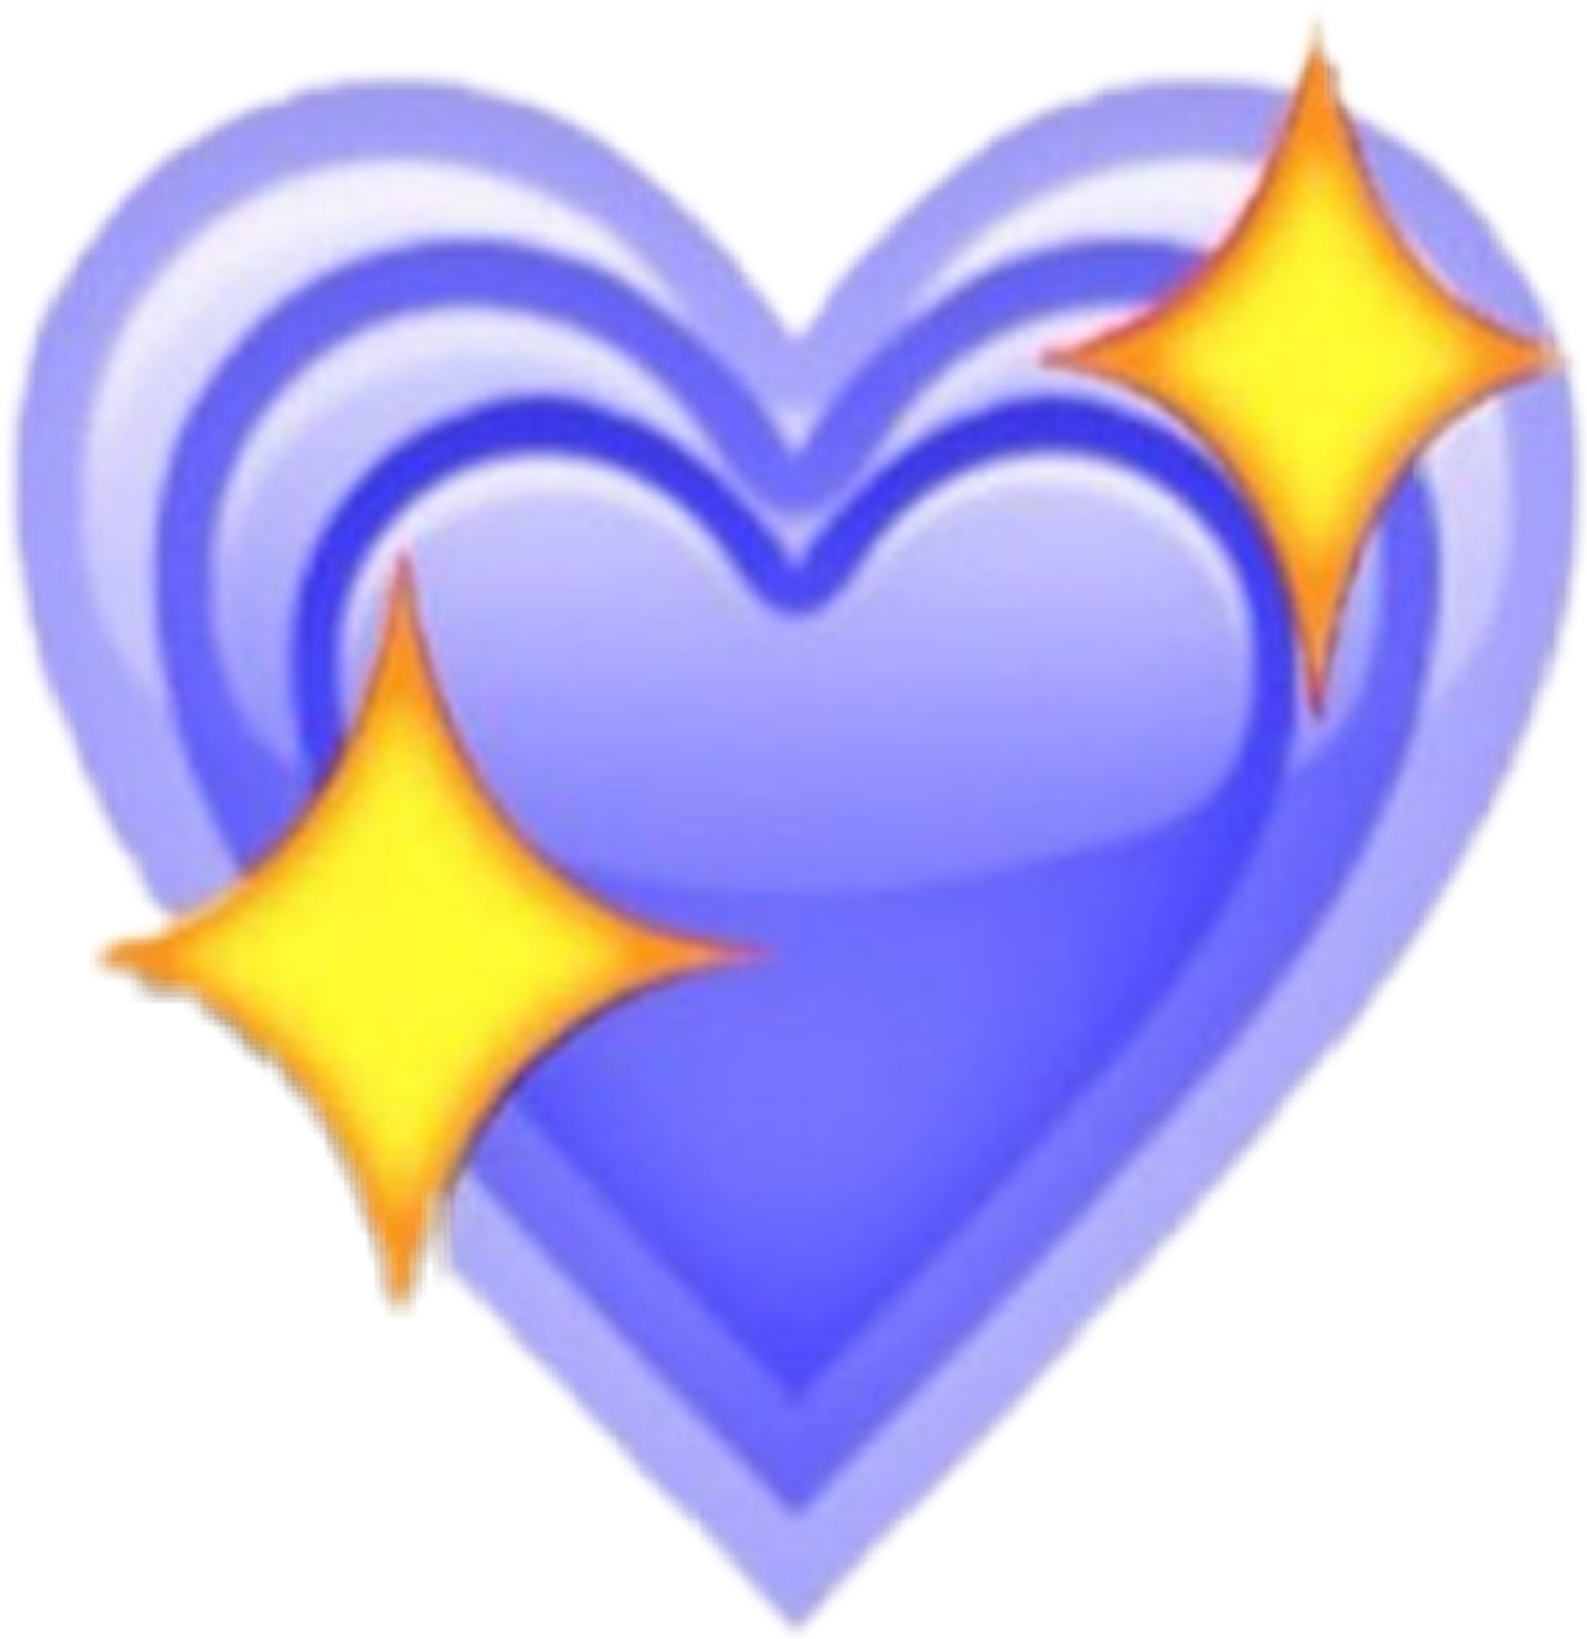 Emoji Cœur Heartapple Bleu Blue Cœurbleu